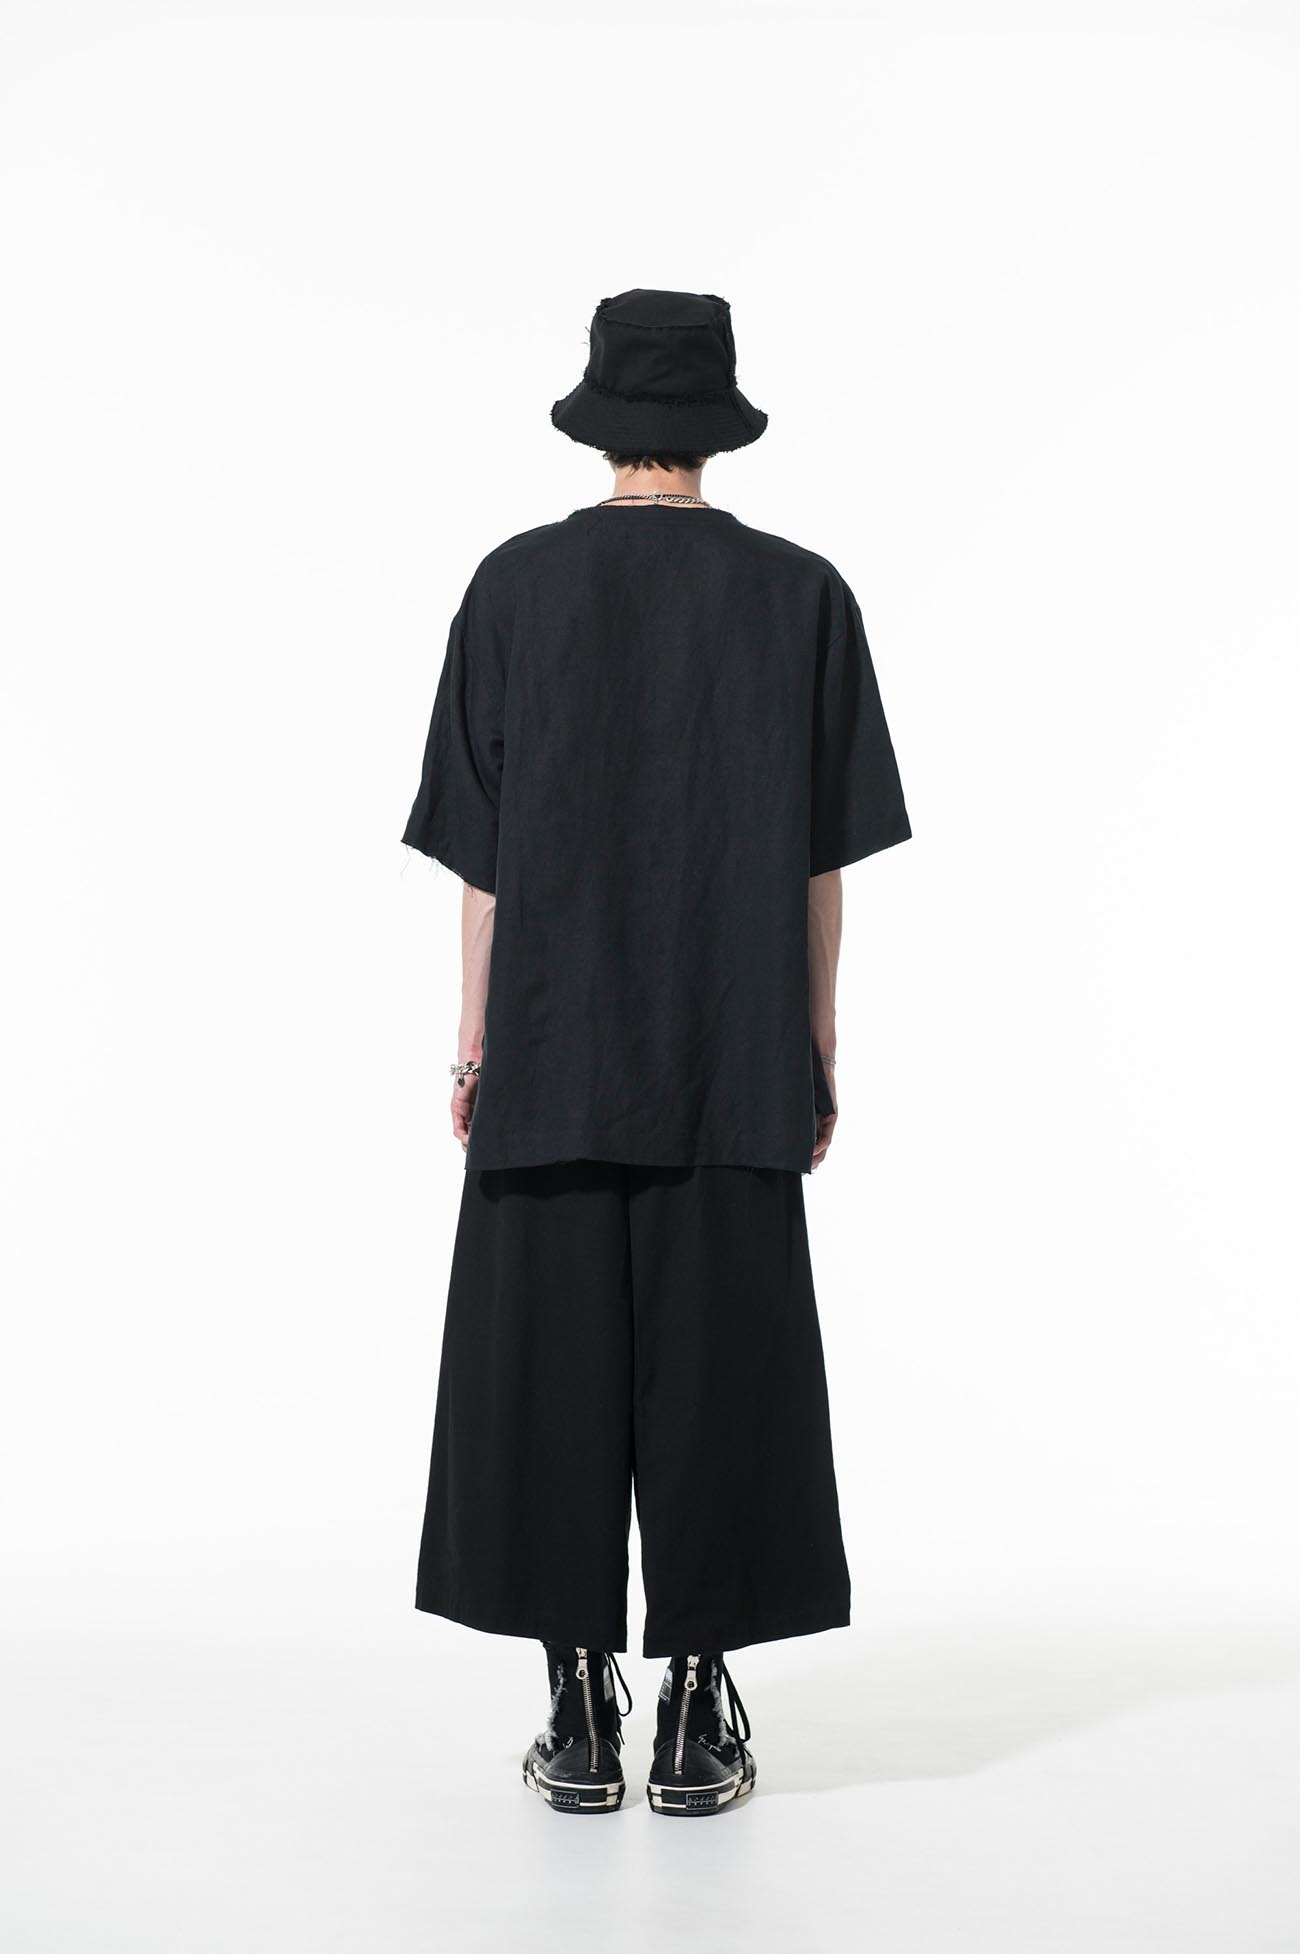 Ry/Li Easy Cross Crew neck shirt pullover